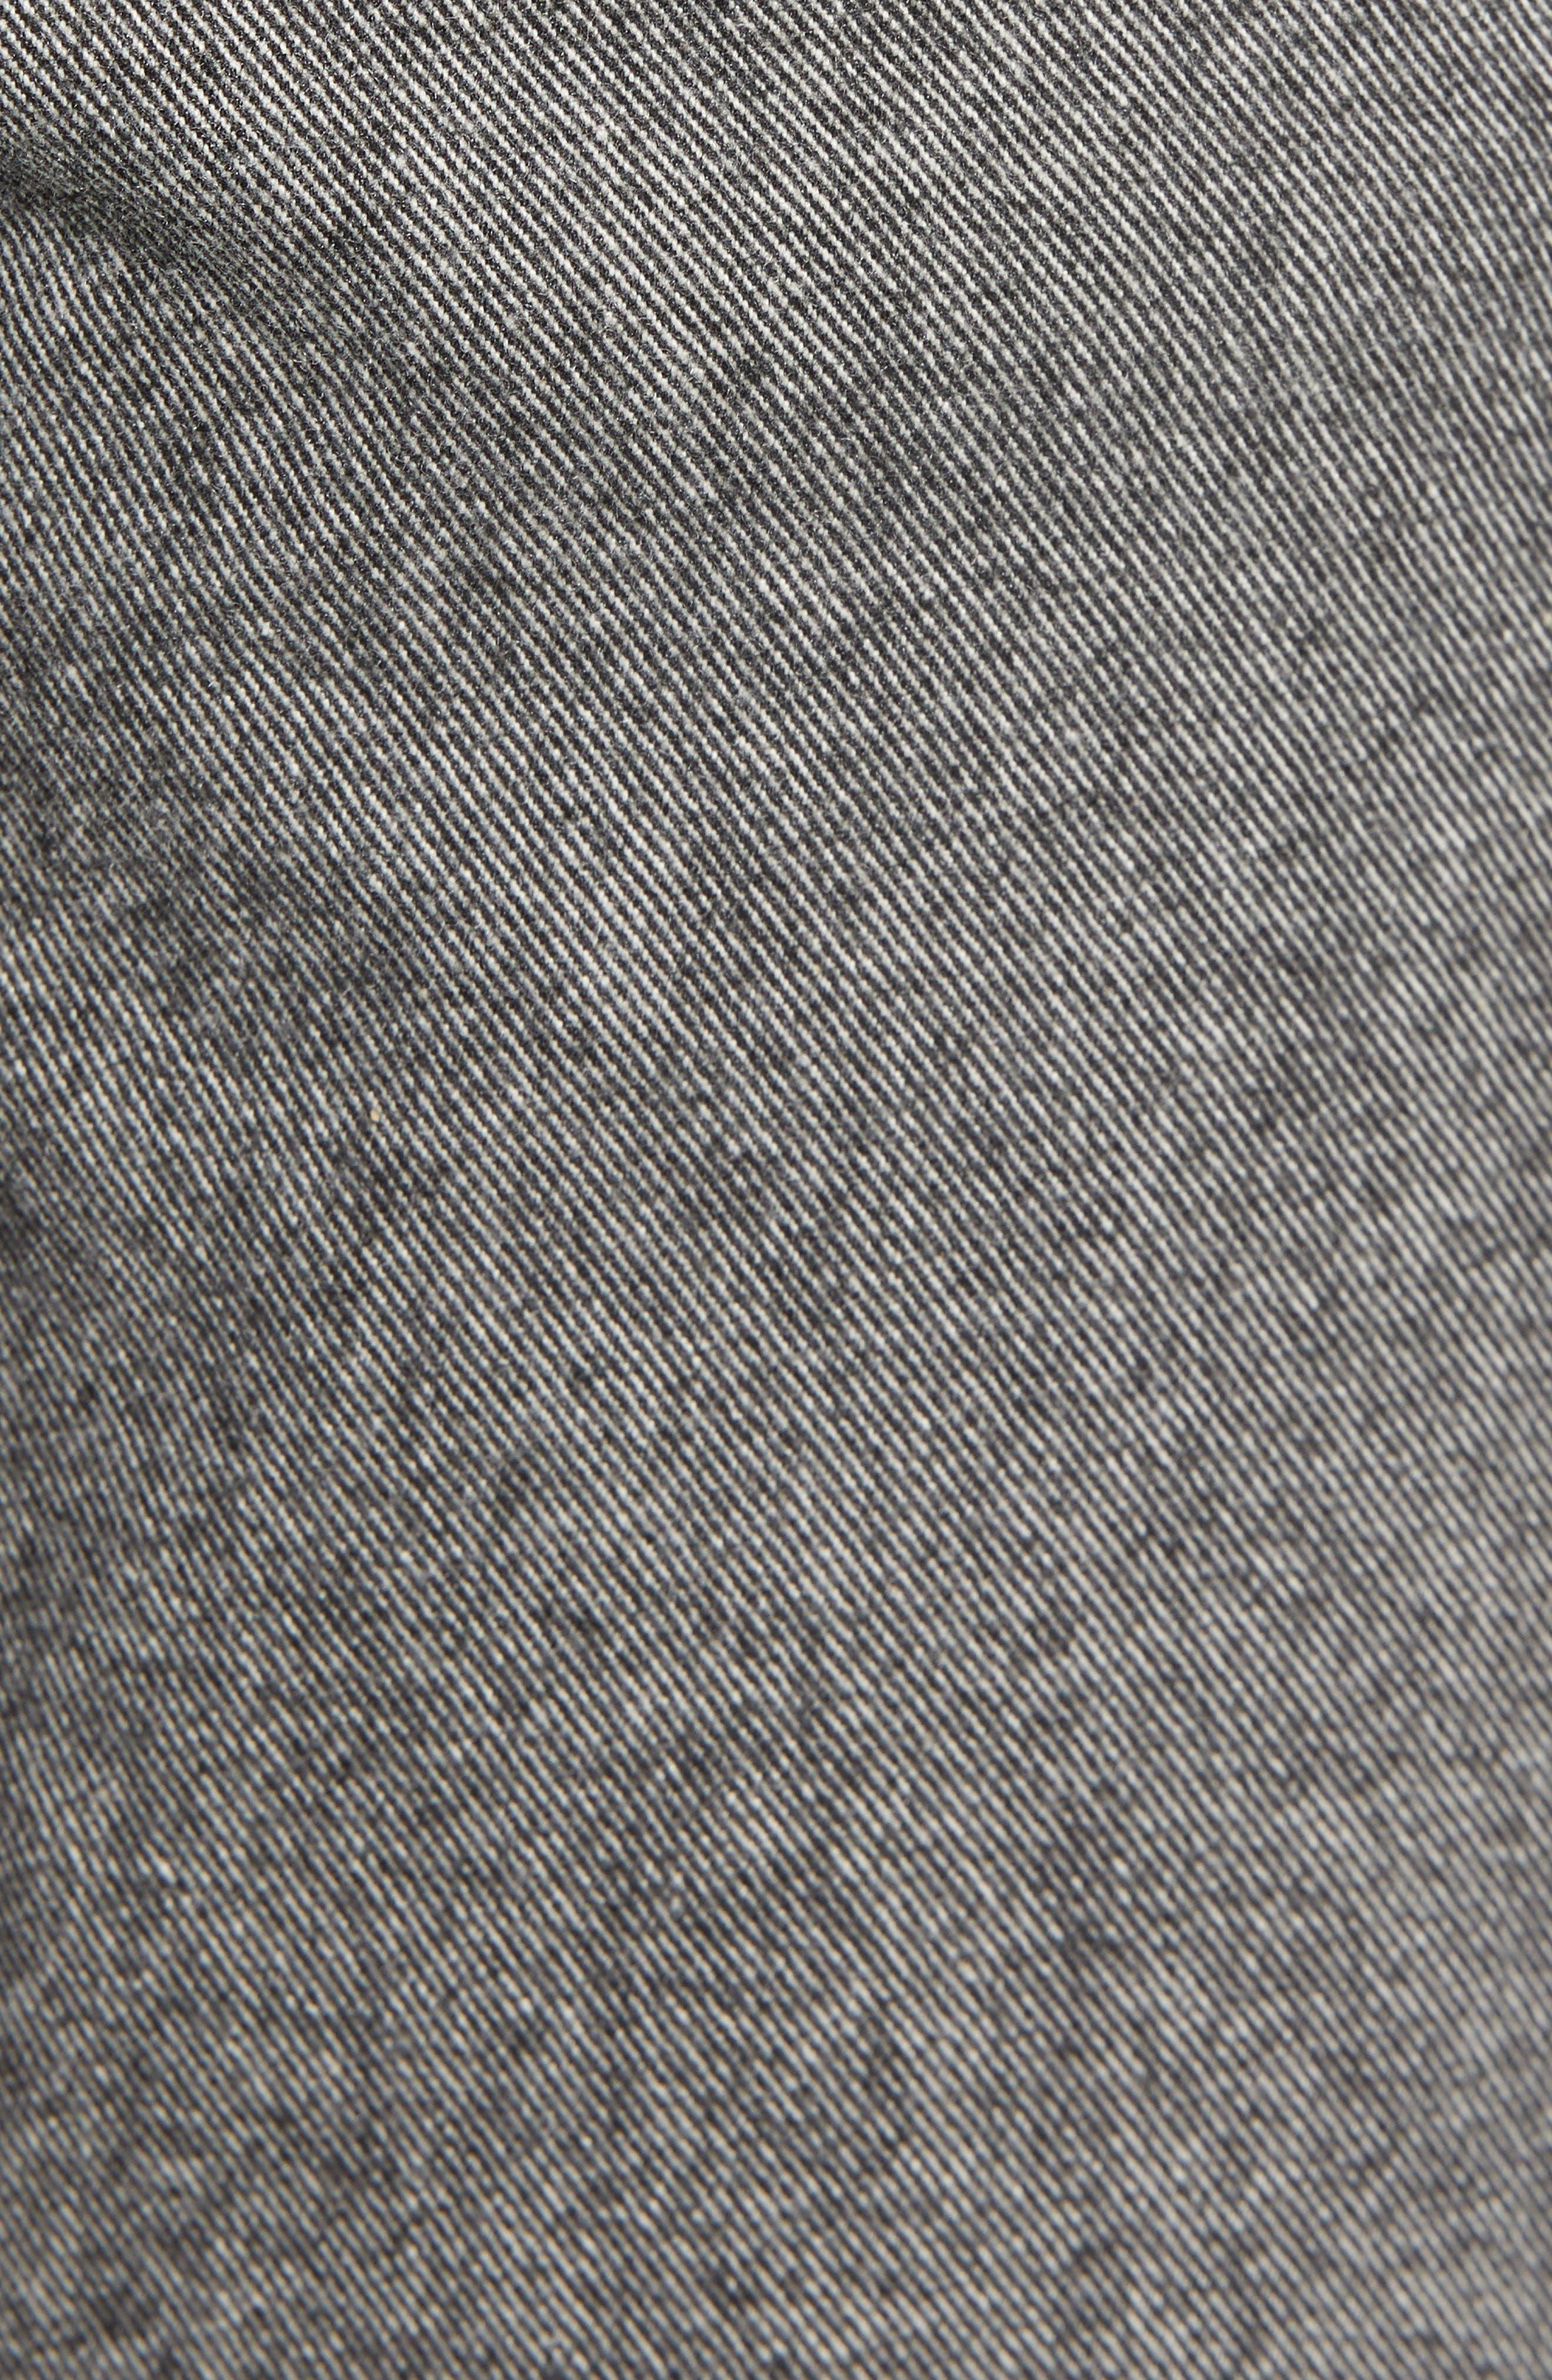 Tyler Slim Fit Jeans,                             Alternate thumbnail 5, color,                             ELECTUS MELANGE